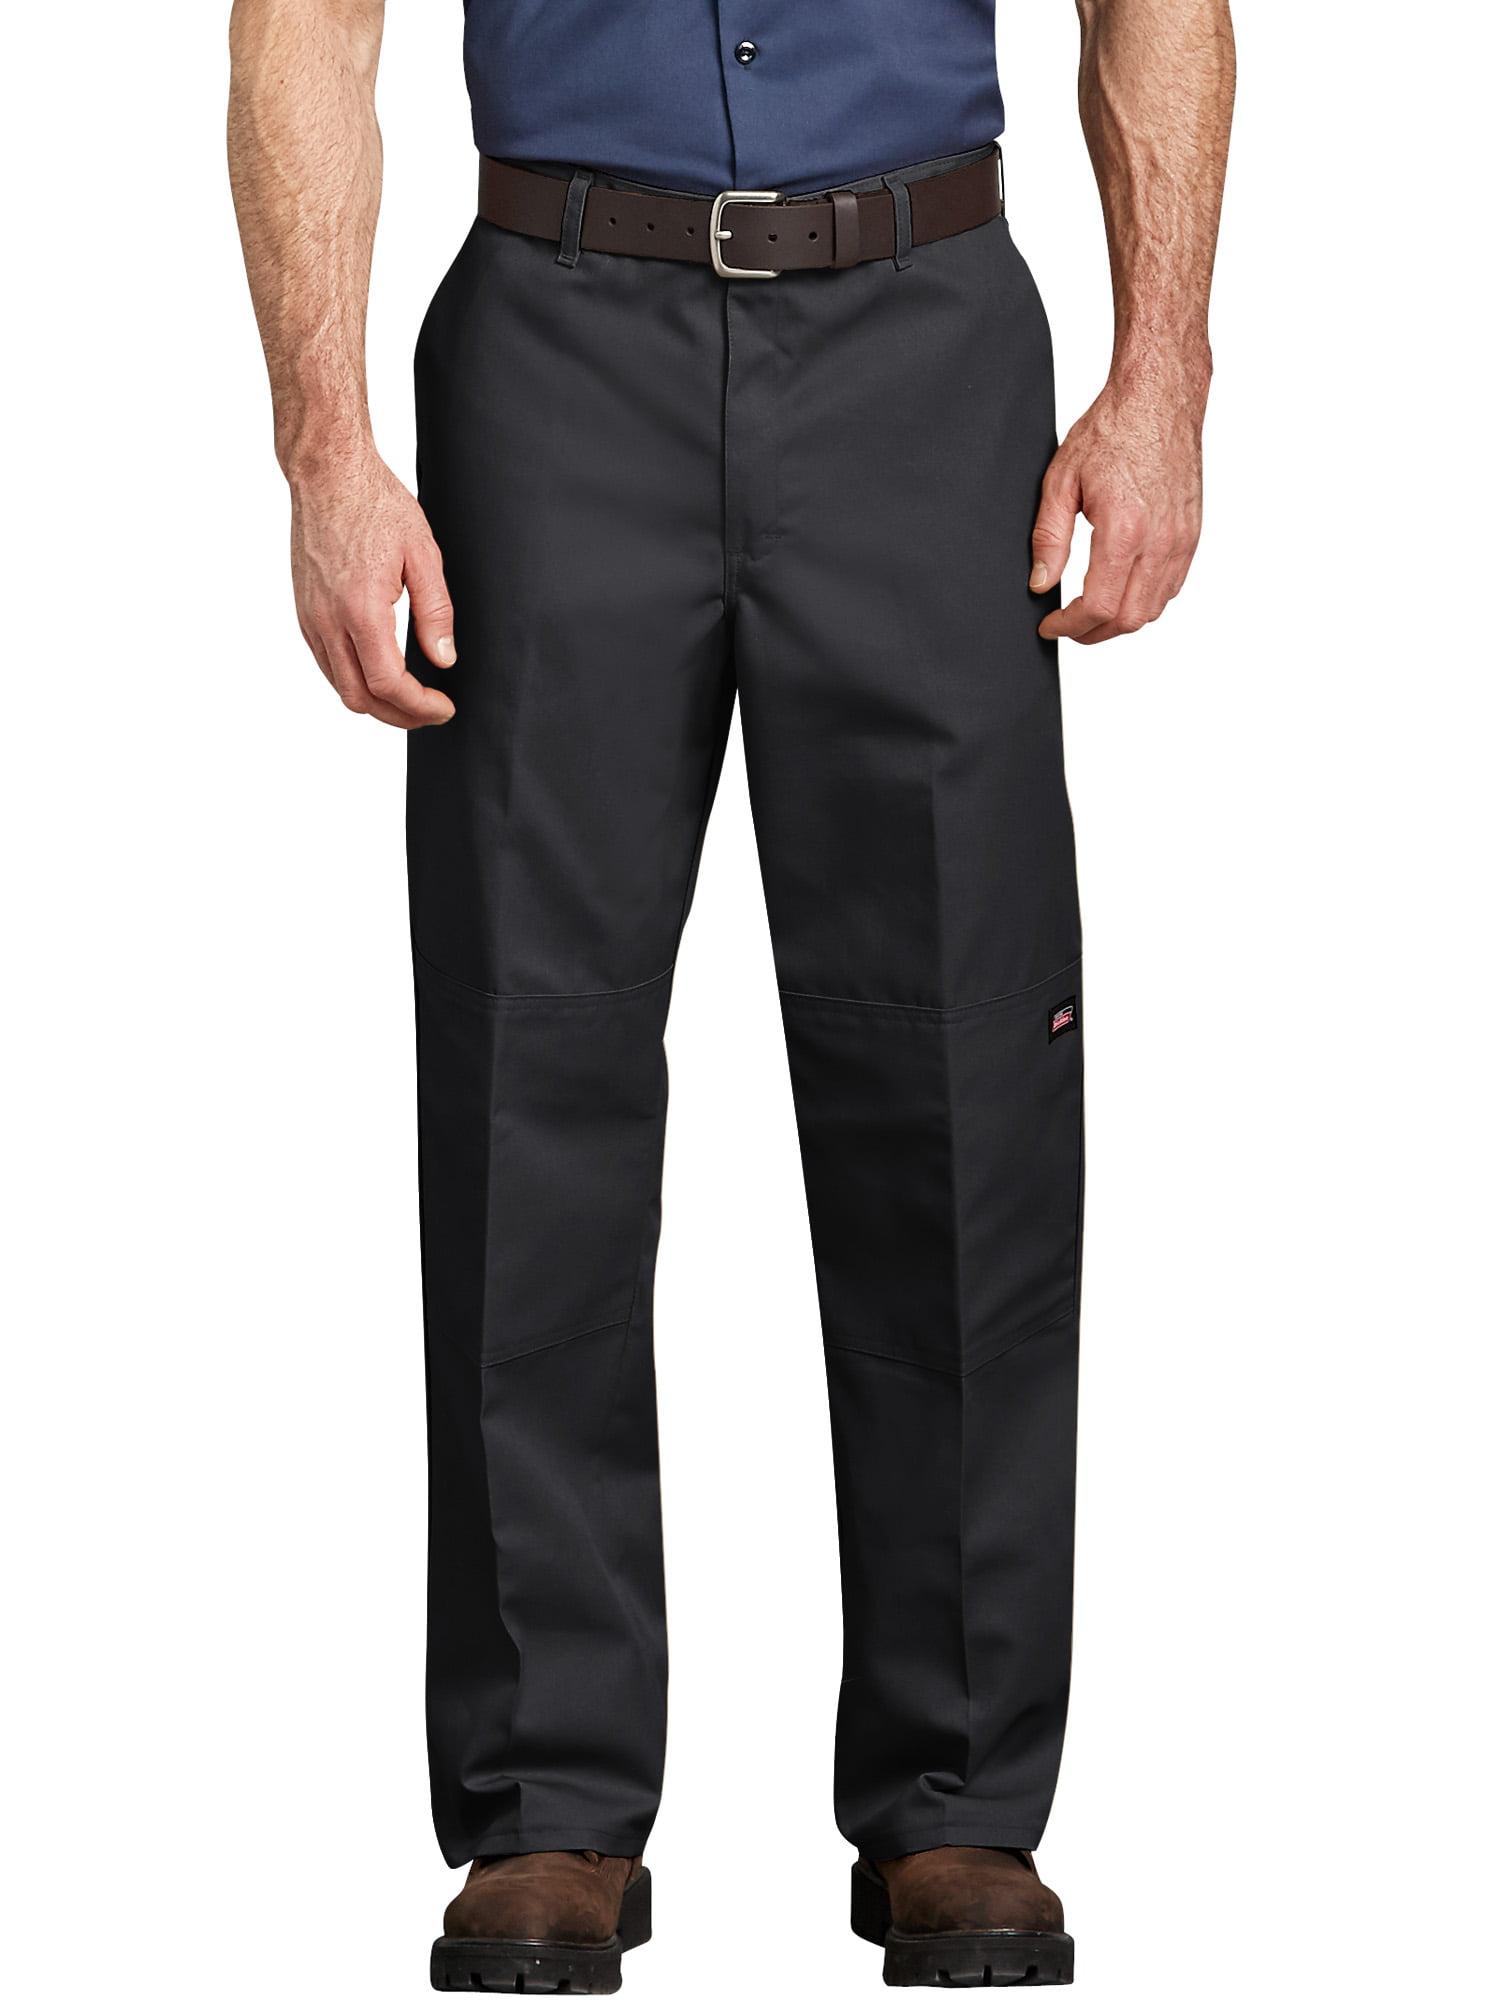 Men's Loose Fit Straight Leg Double-Knee Work Pants